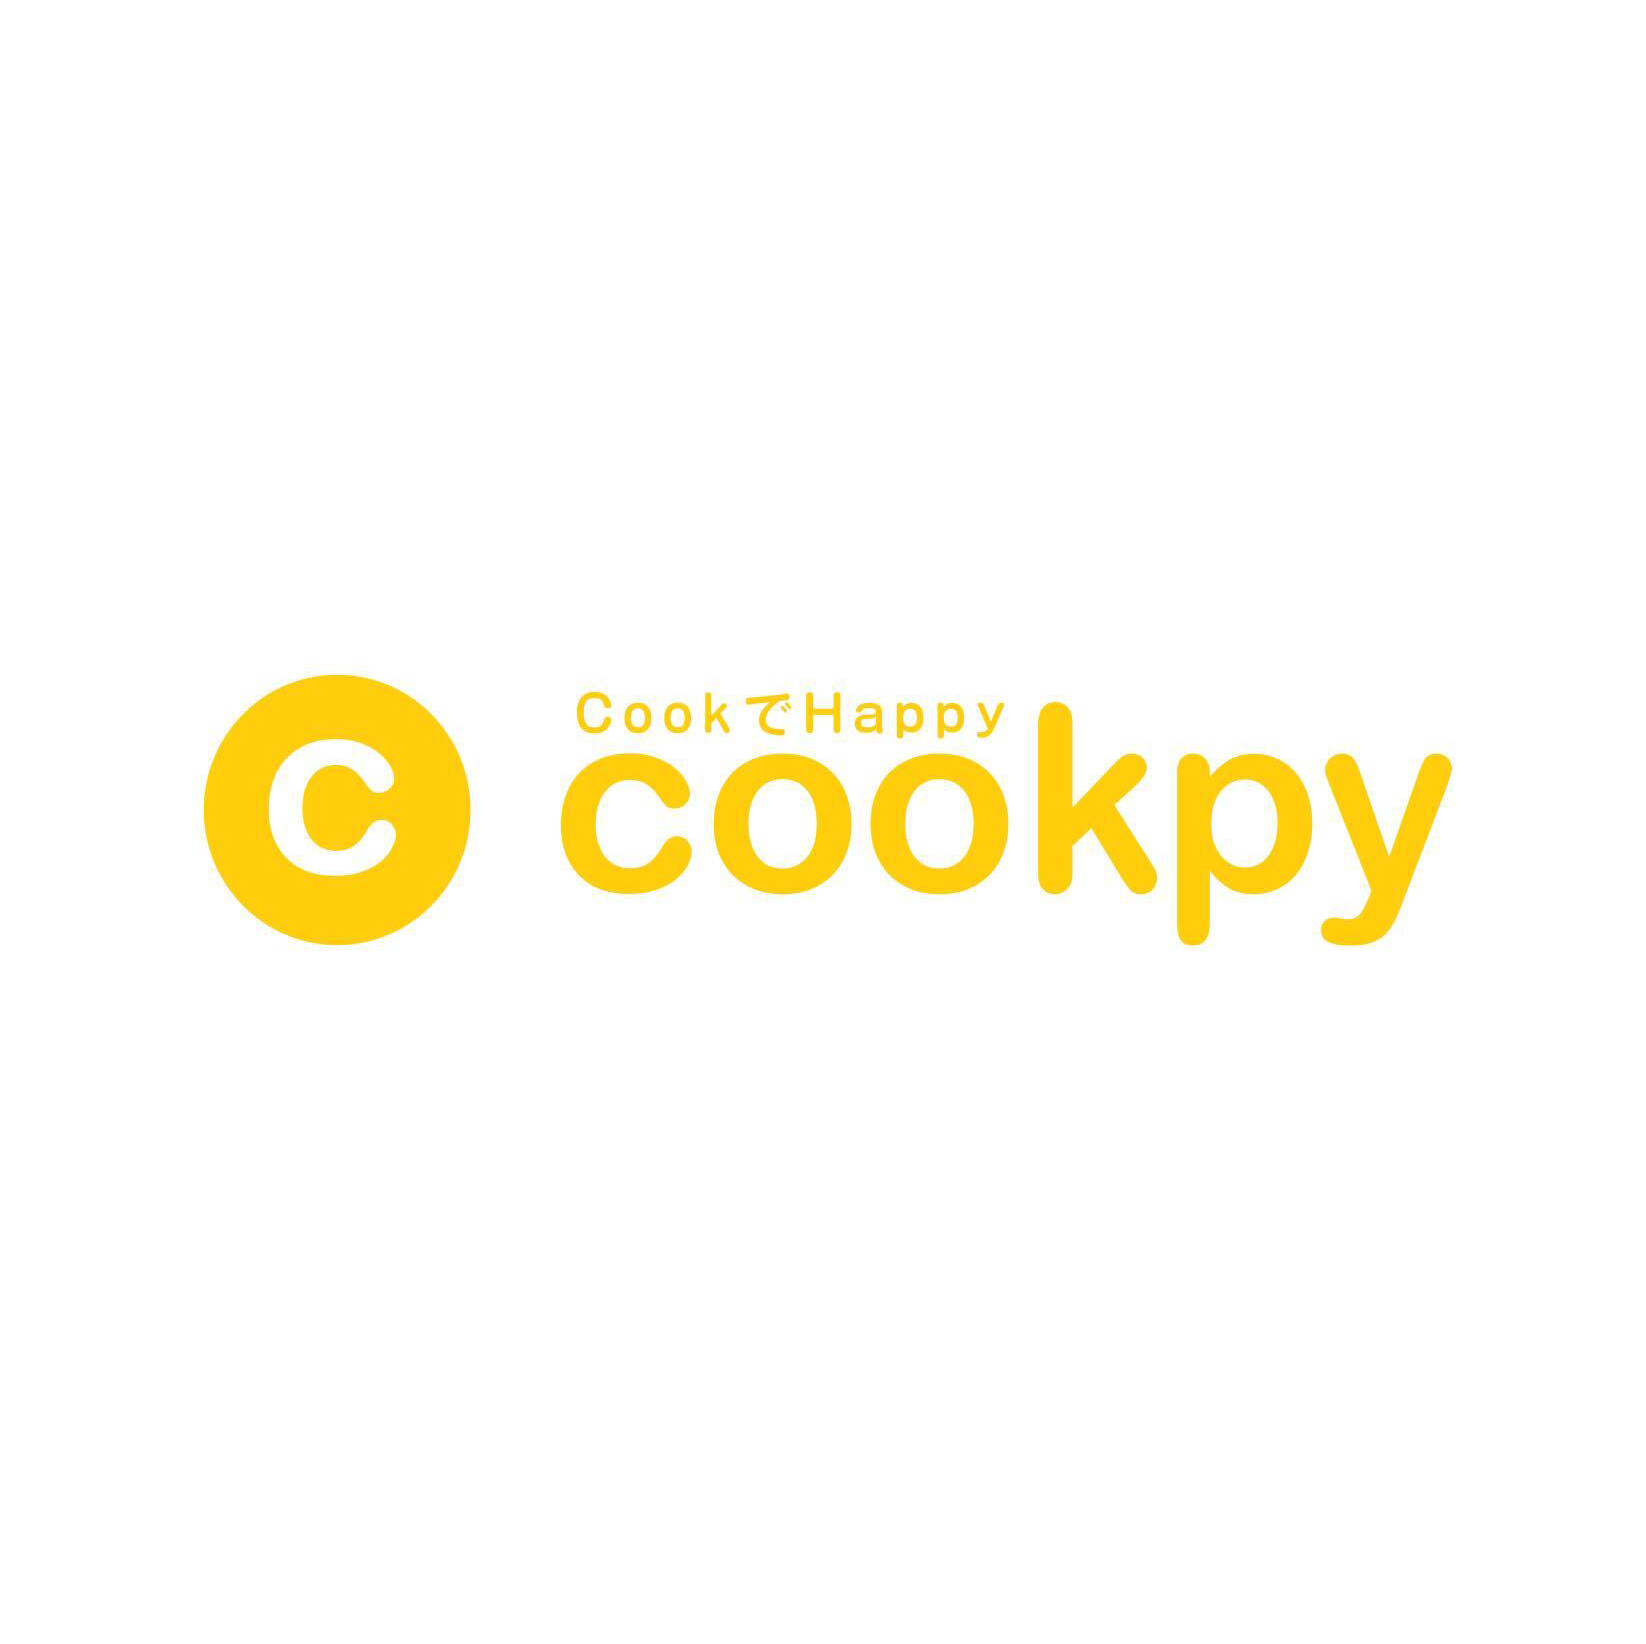 cookpy